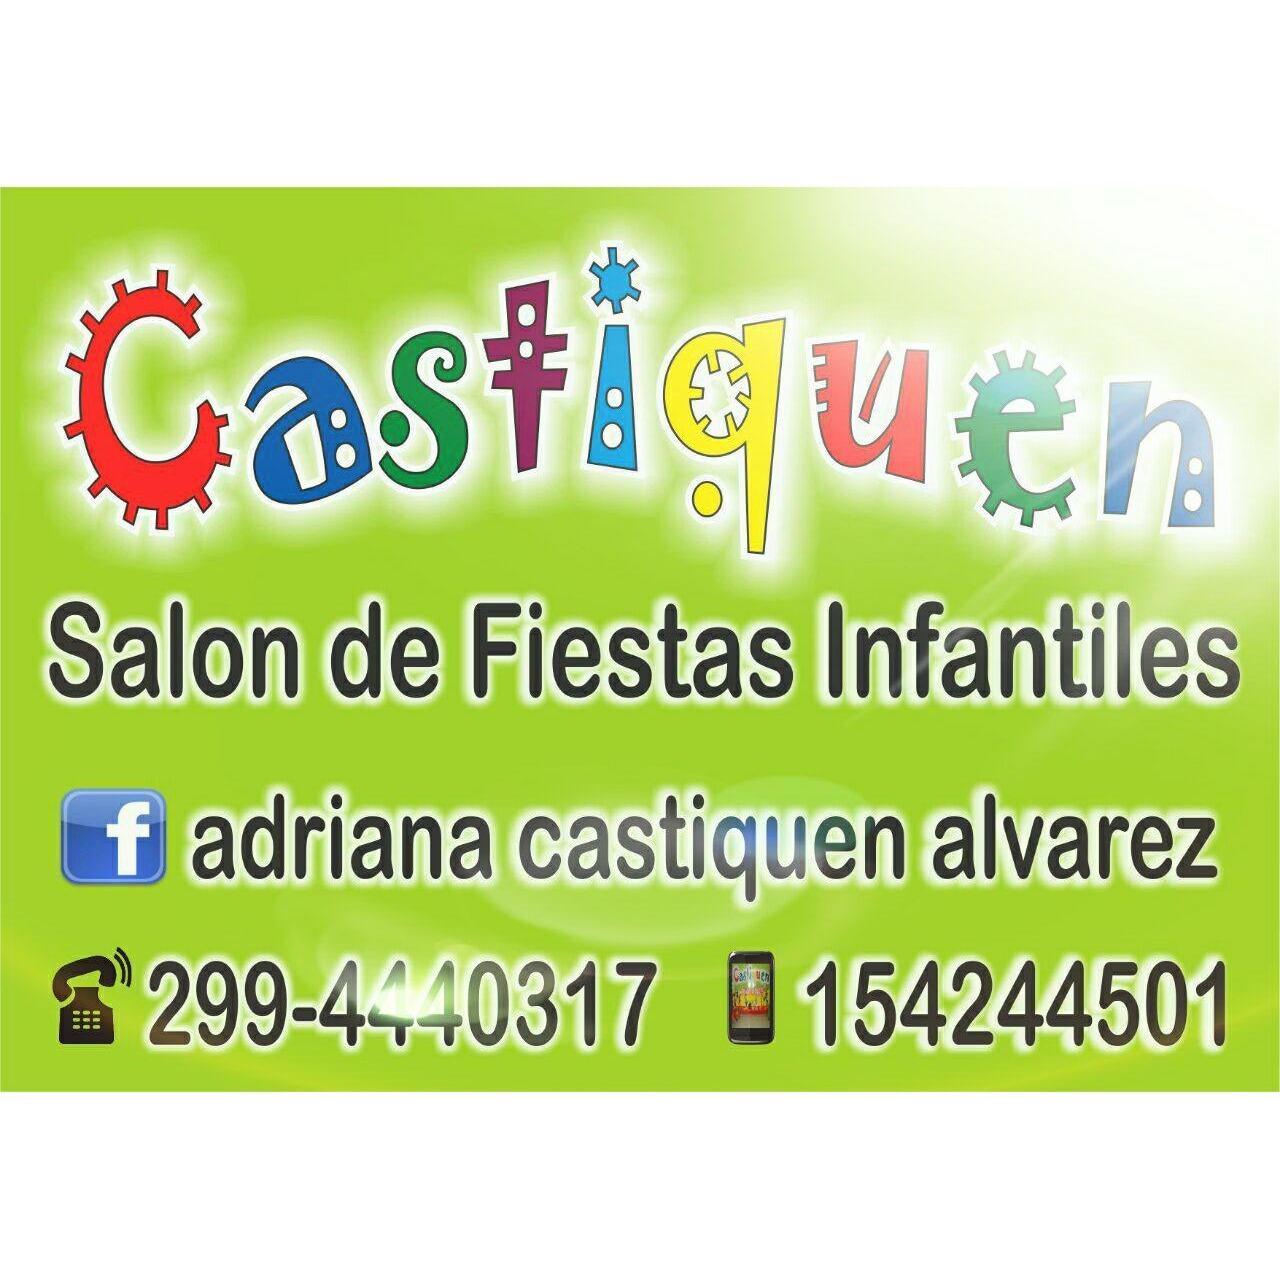 CASTIQUEN